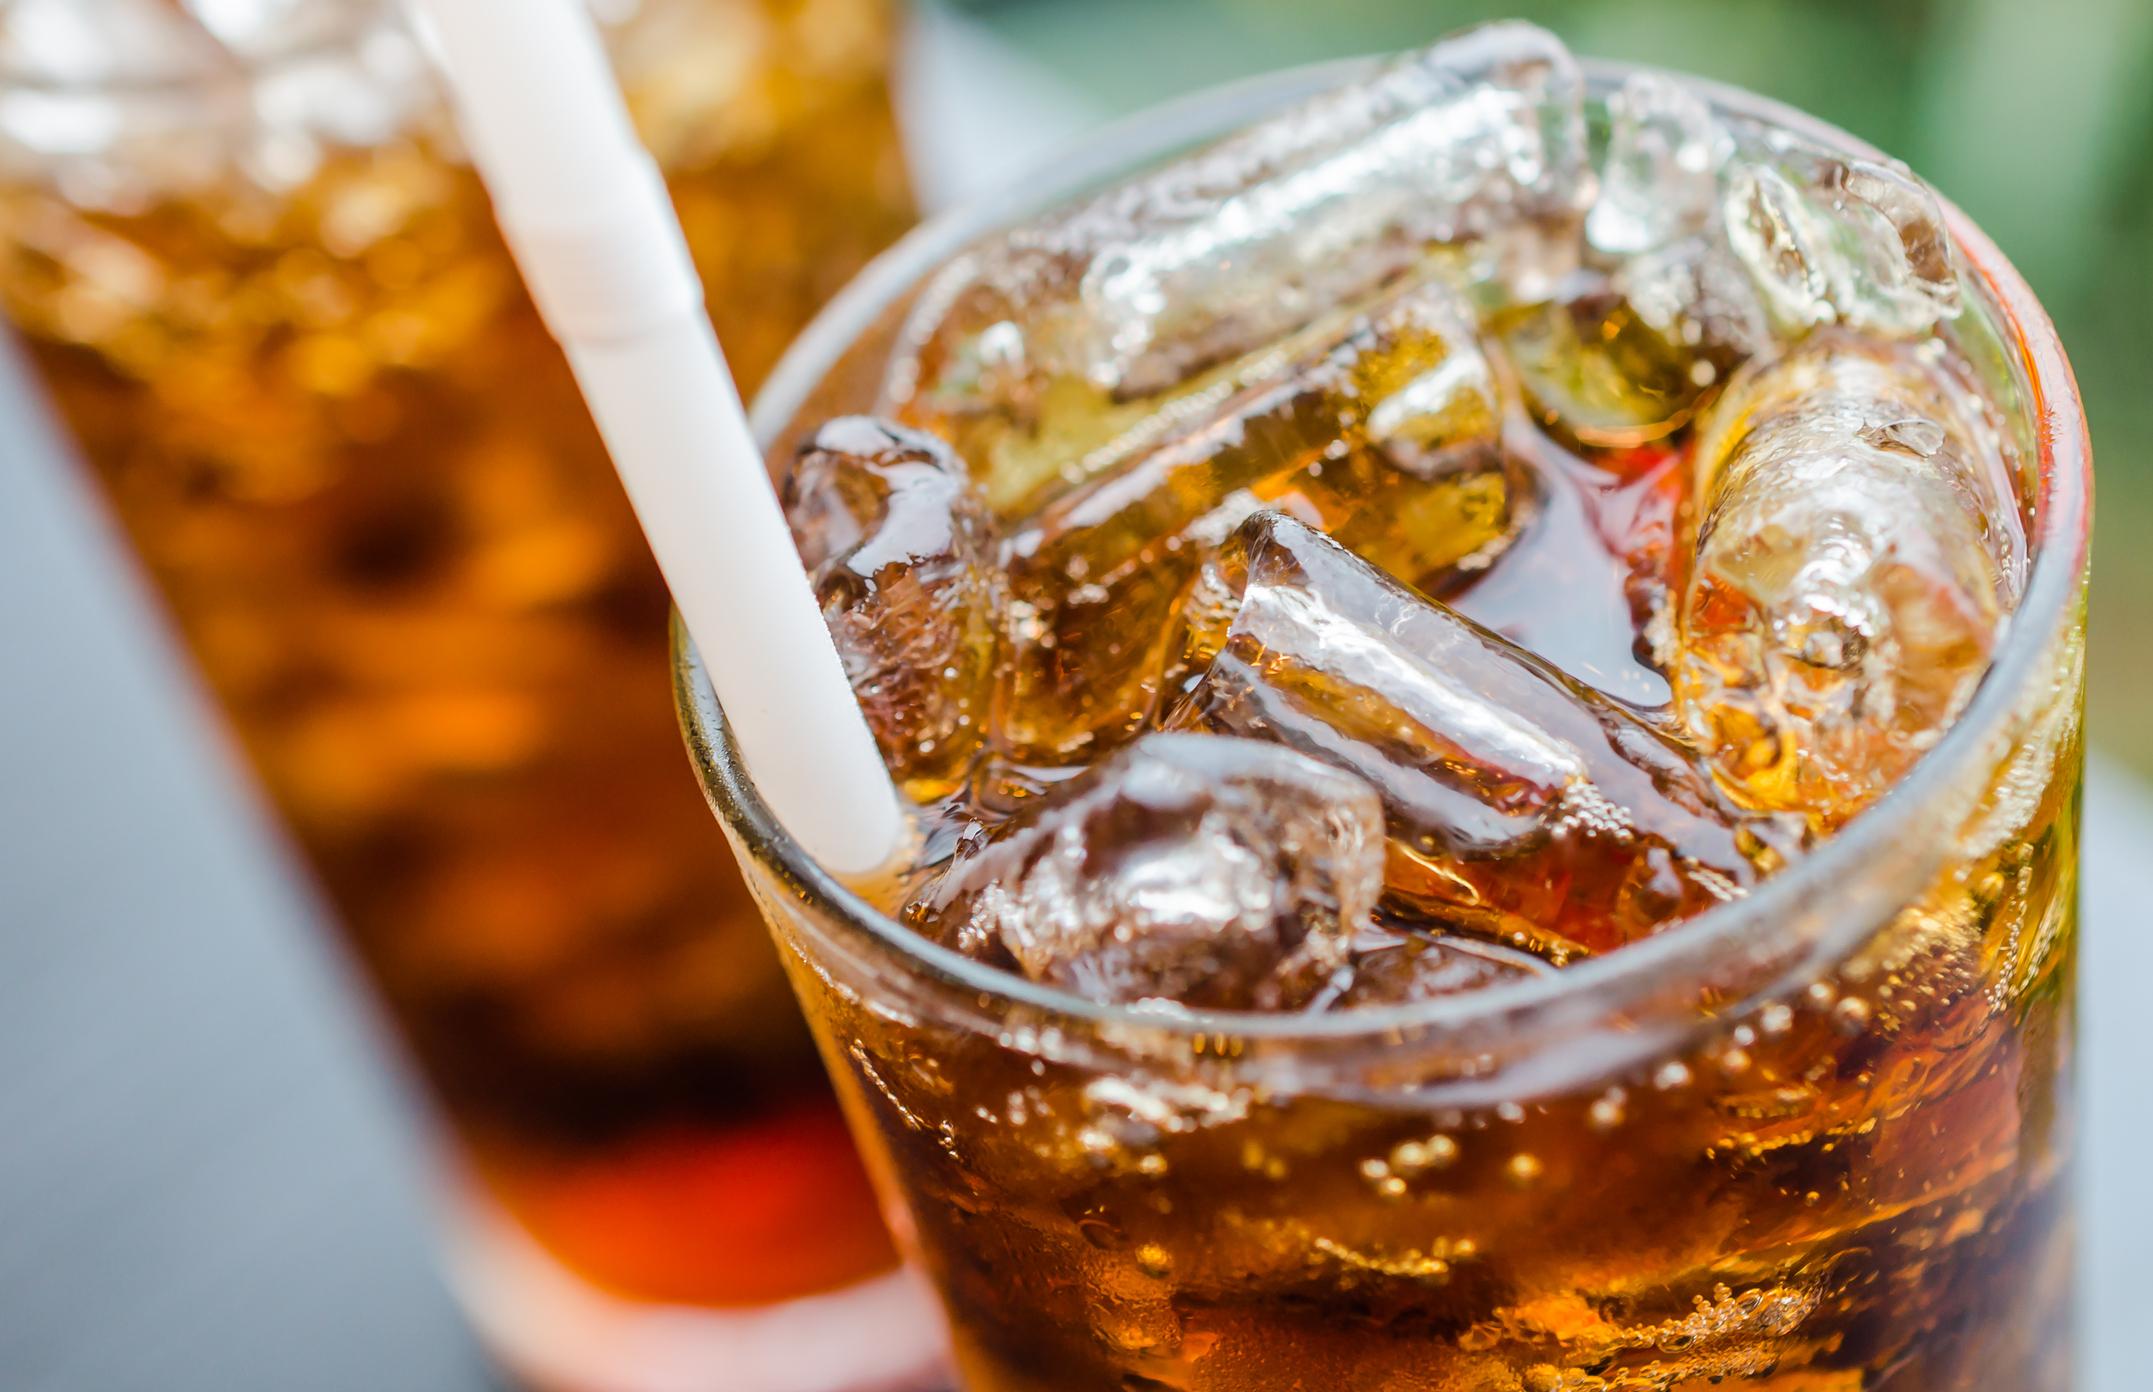 A glass of soda with a straw.